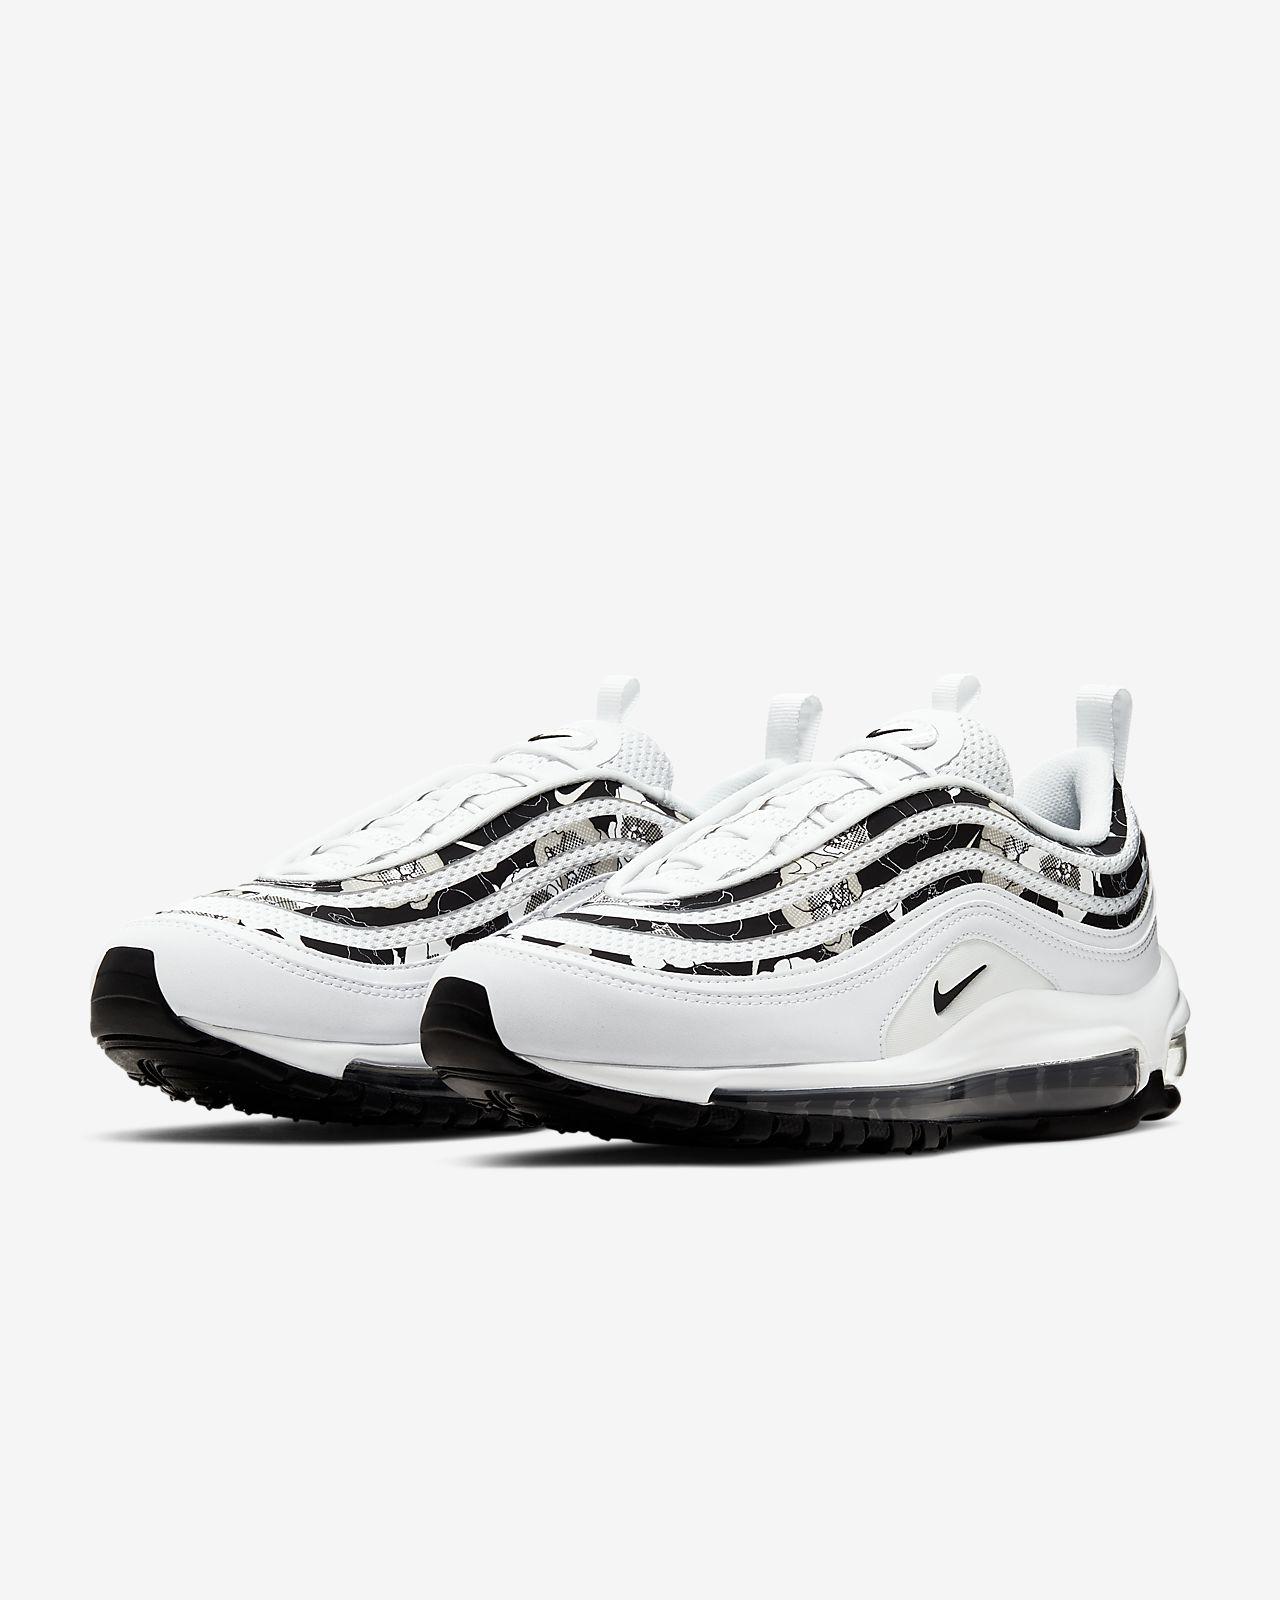 Nike Air Max 97 SE Floral Women's Shoe